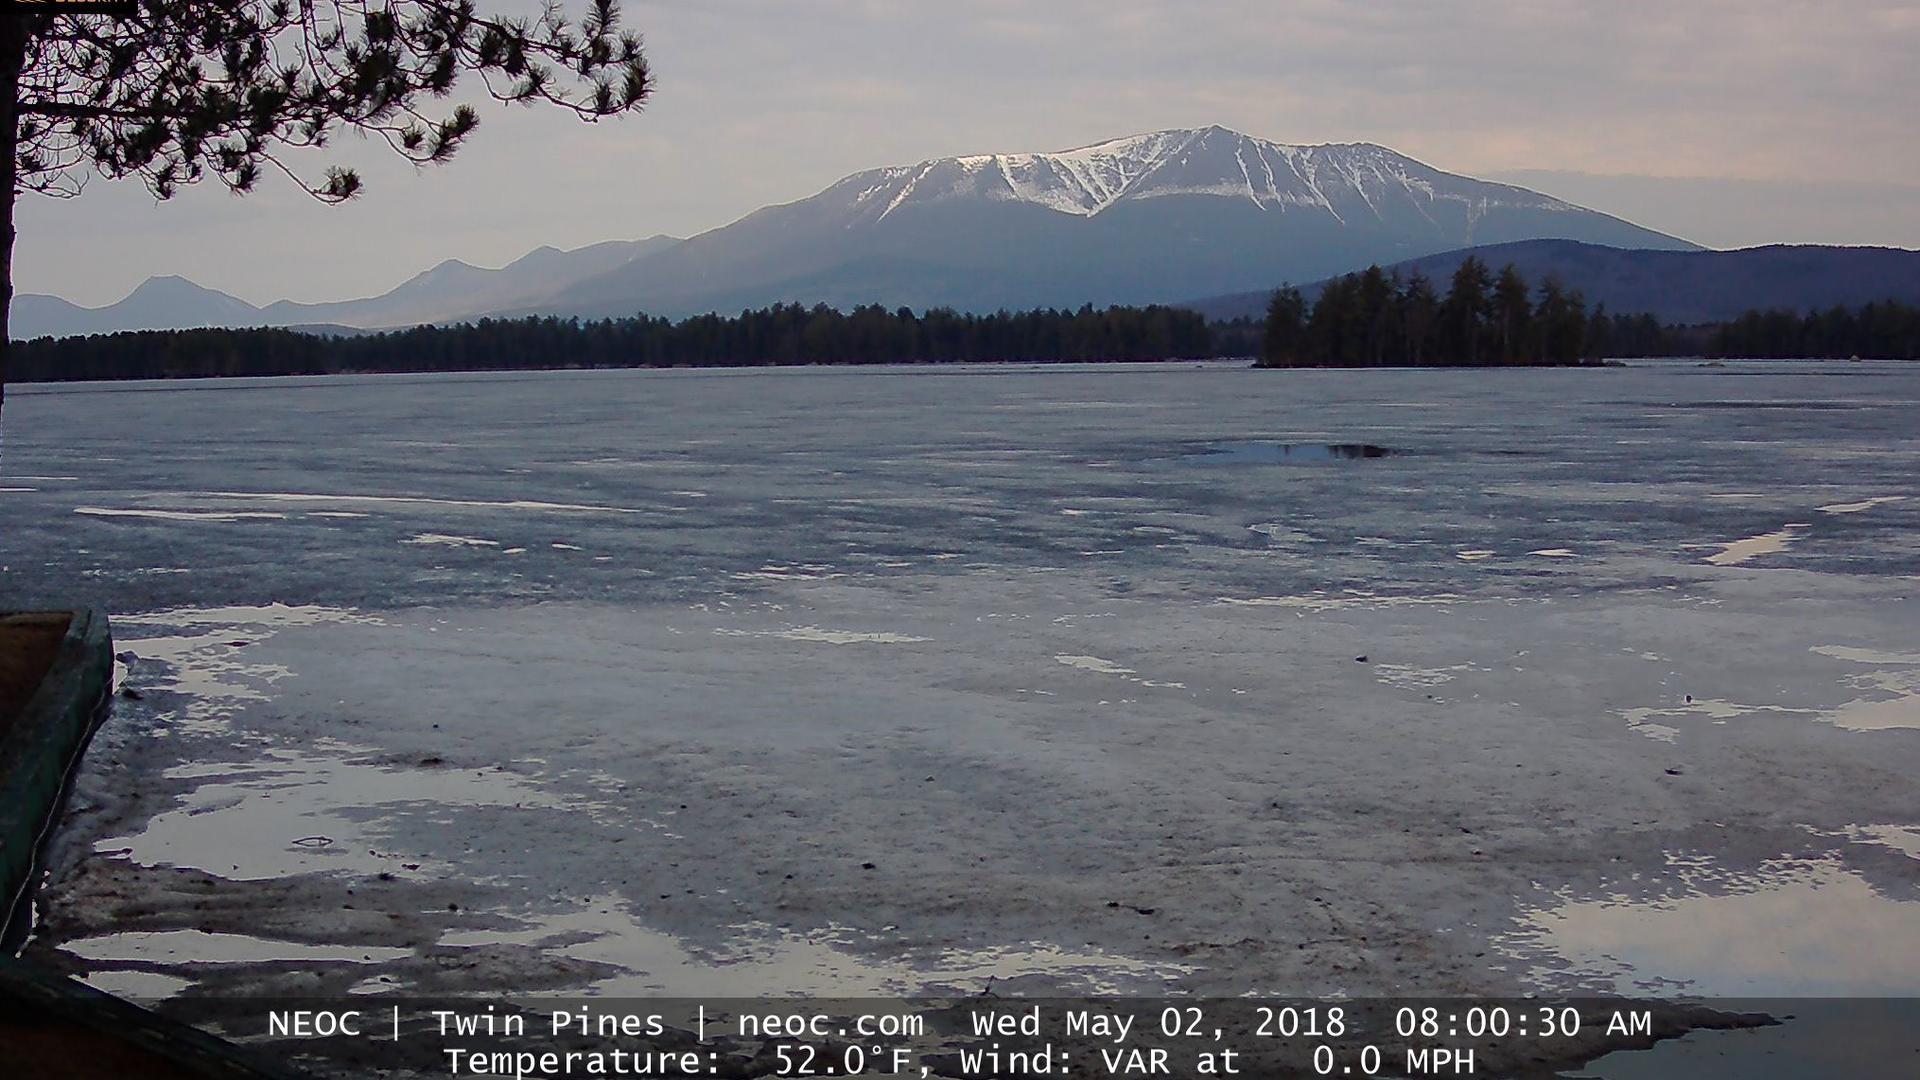 Webcam Norcross: Millinocket − Twin Pine Camps